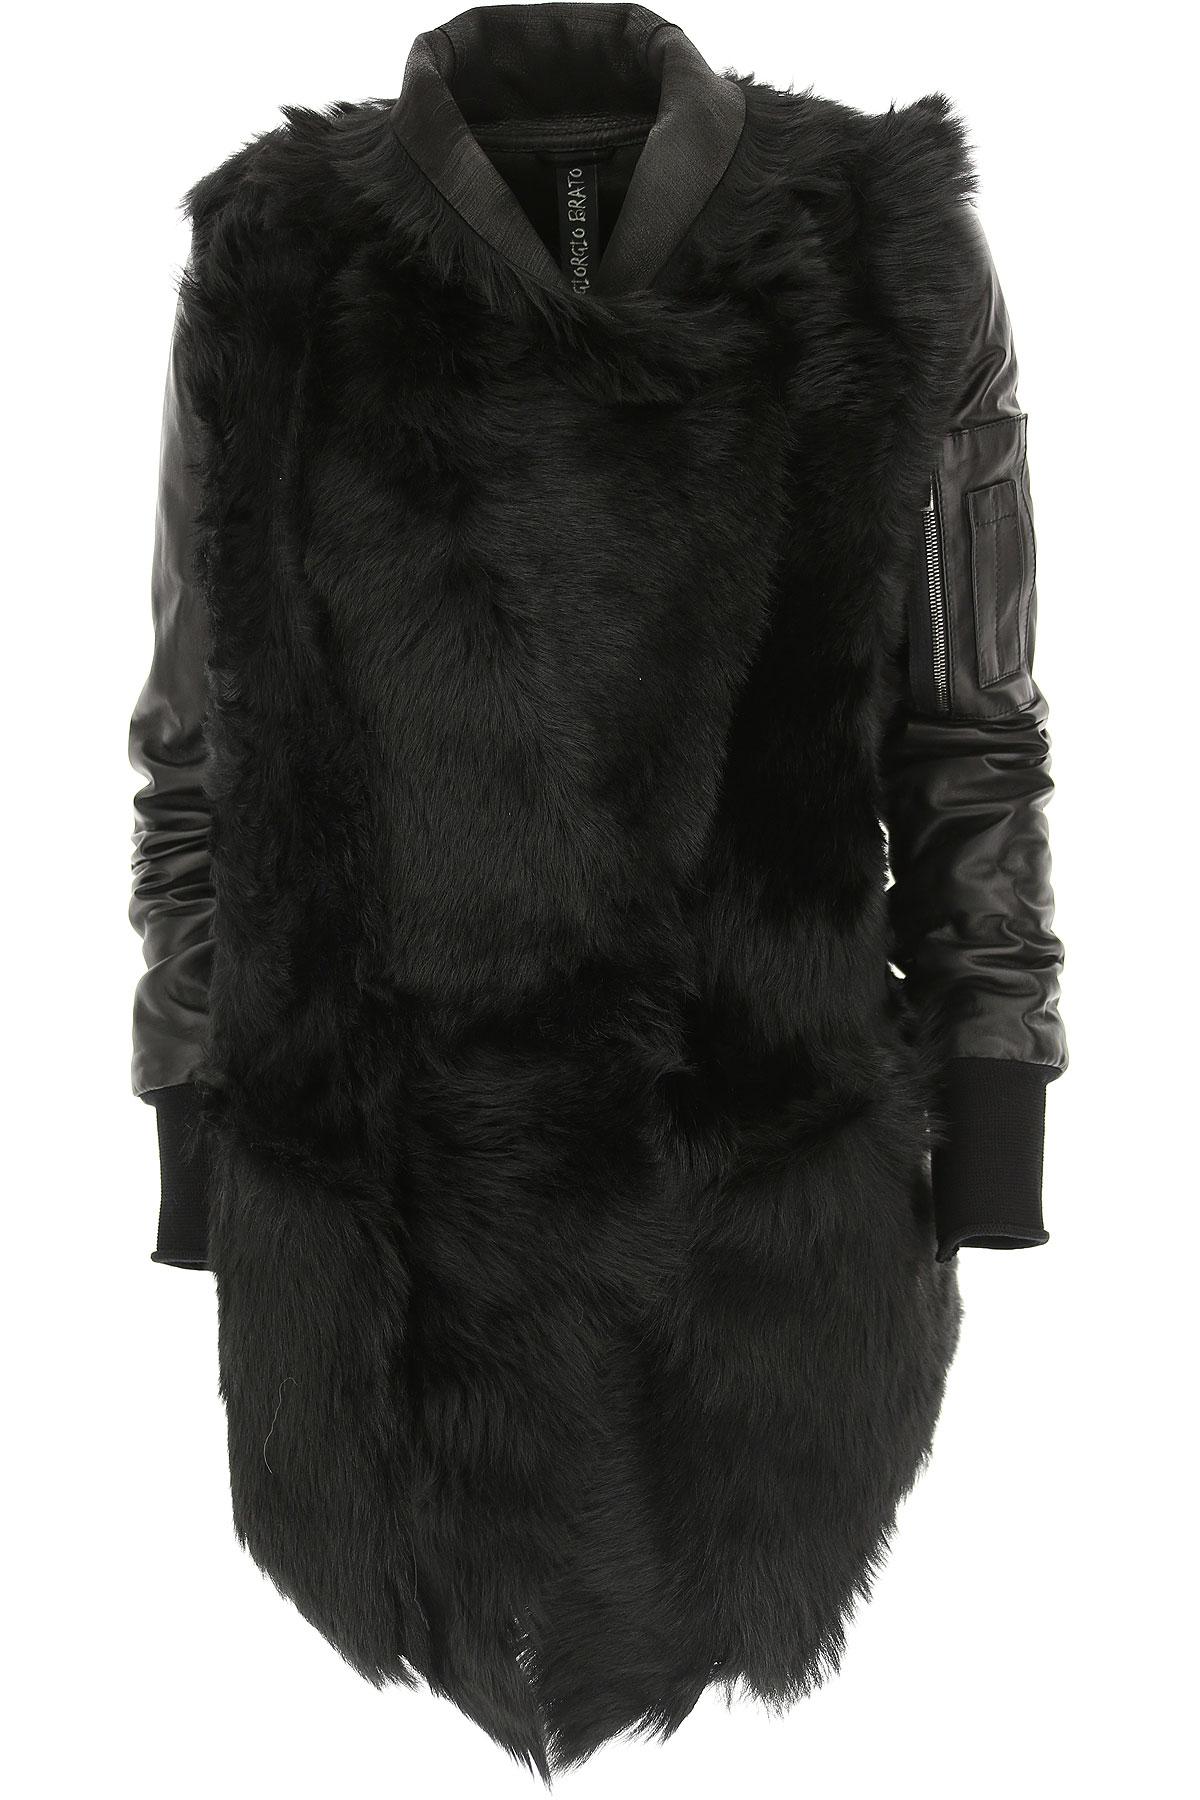 Image of WLG by Giorgio Brato Women\'s Coat, Black, Leather, 2017, 10 4 6 8